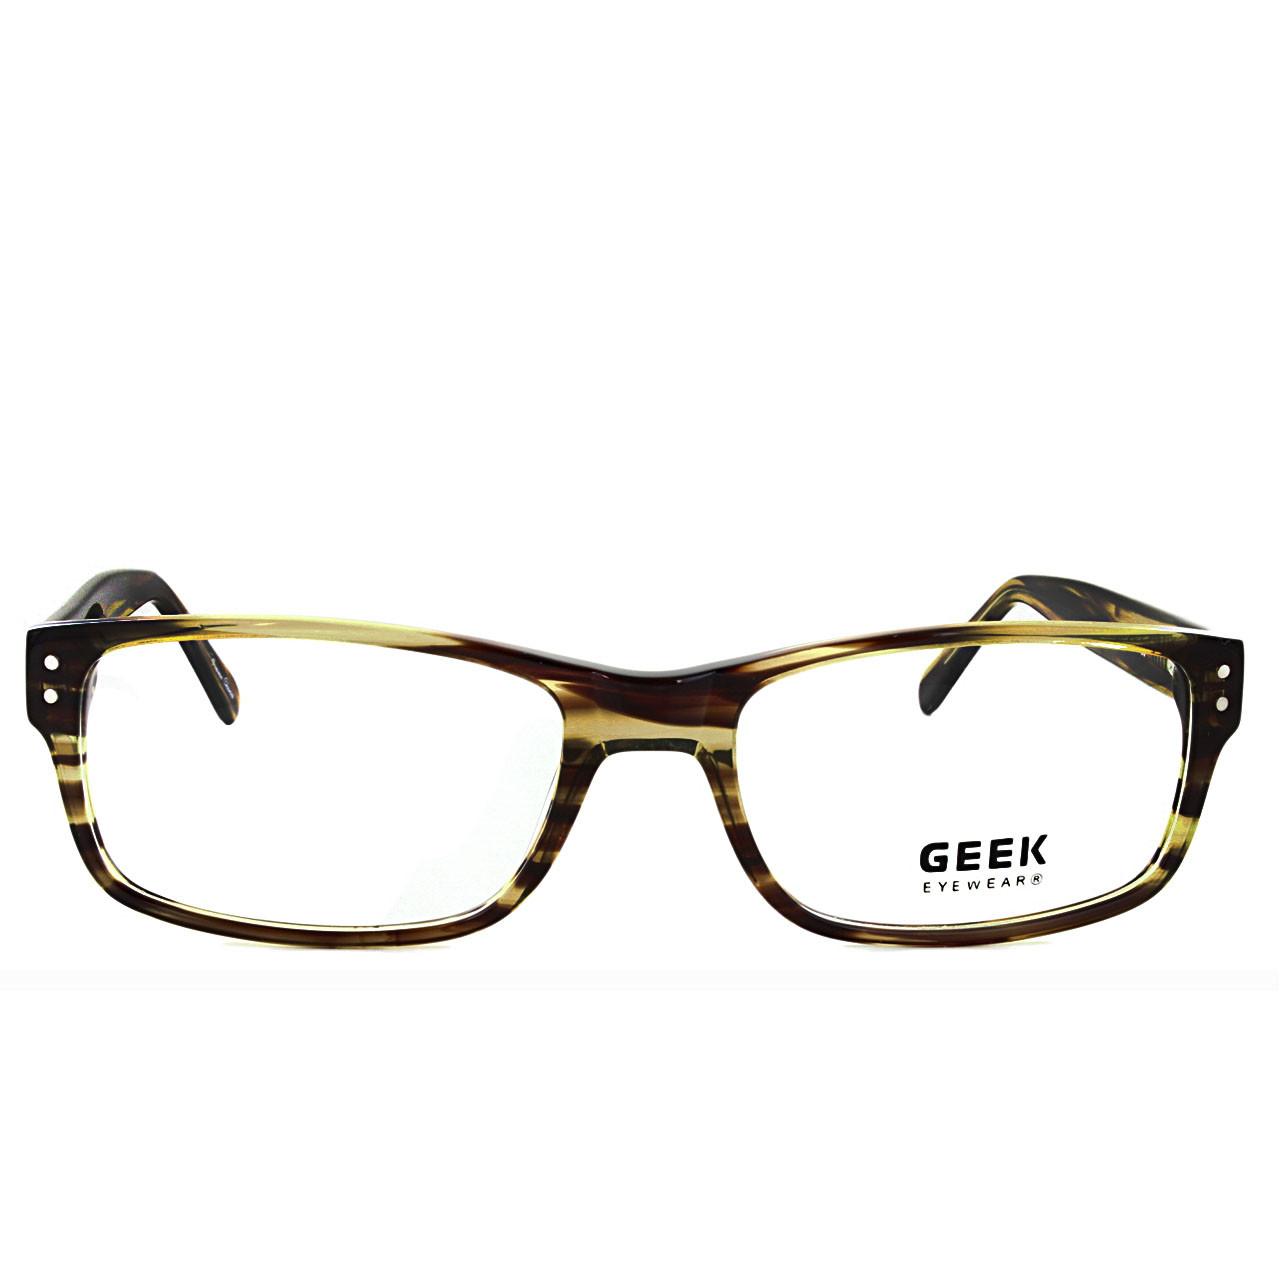 GEEK Eyewear GEEK Gnarly 61-20-155 mm